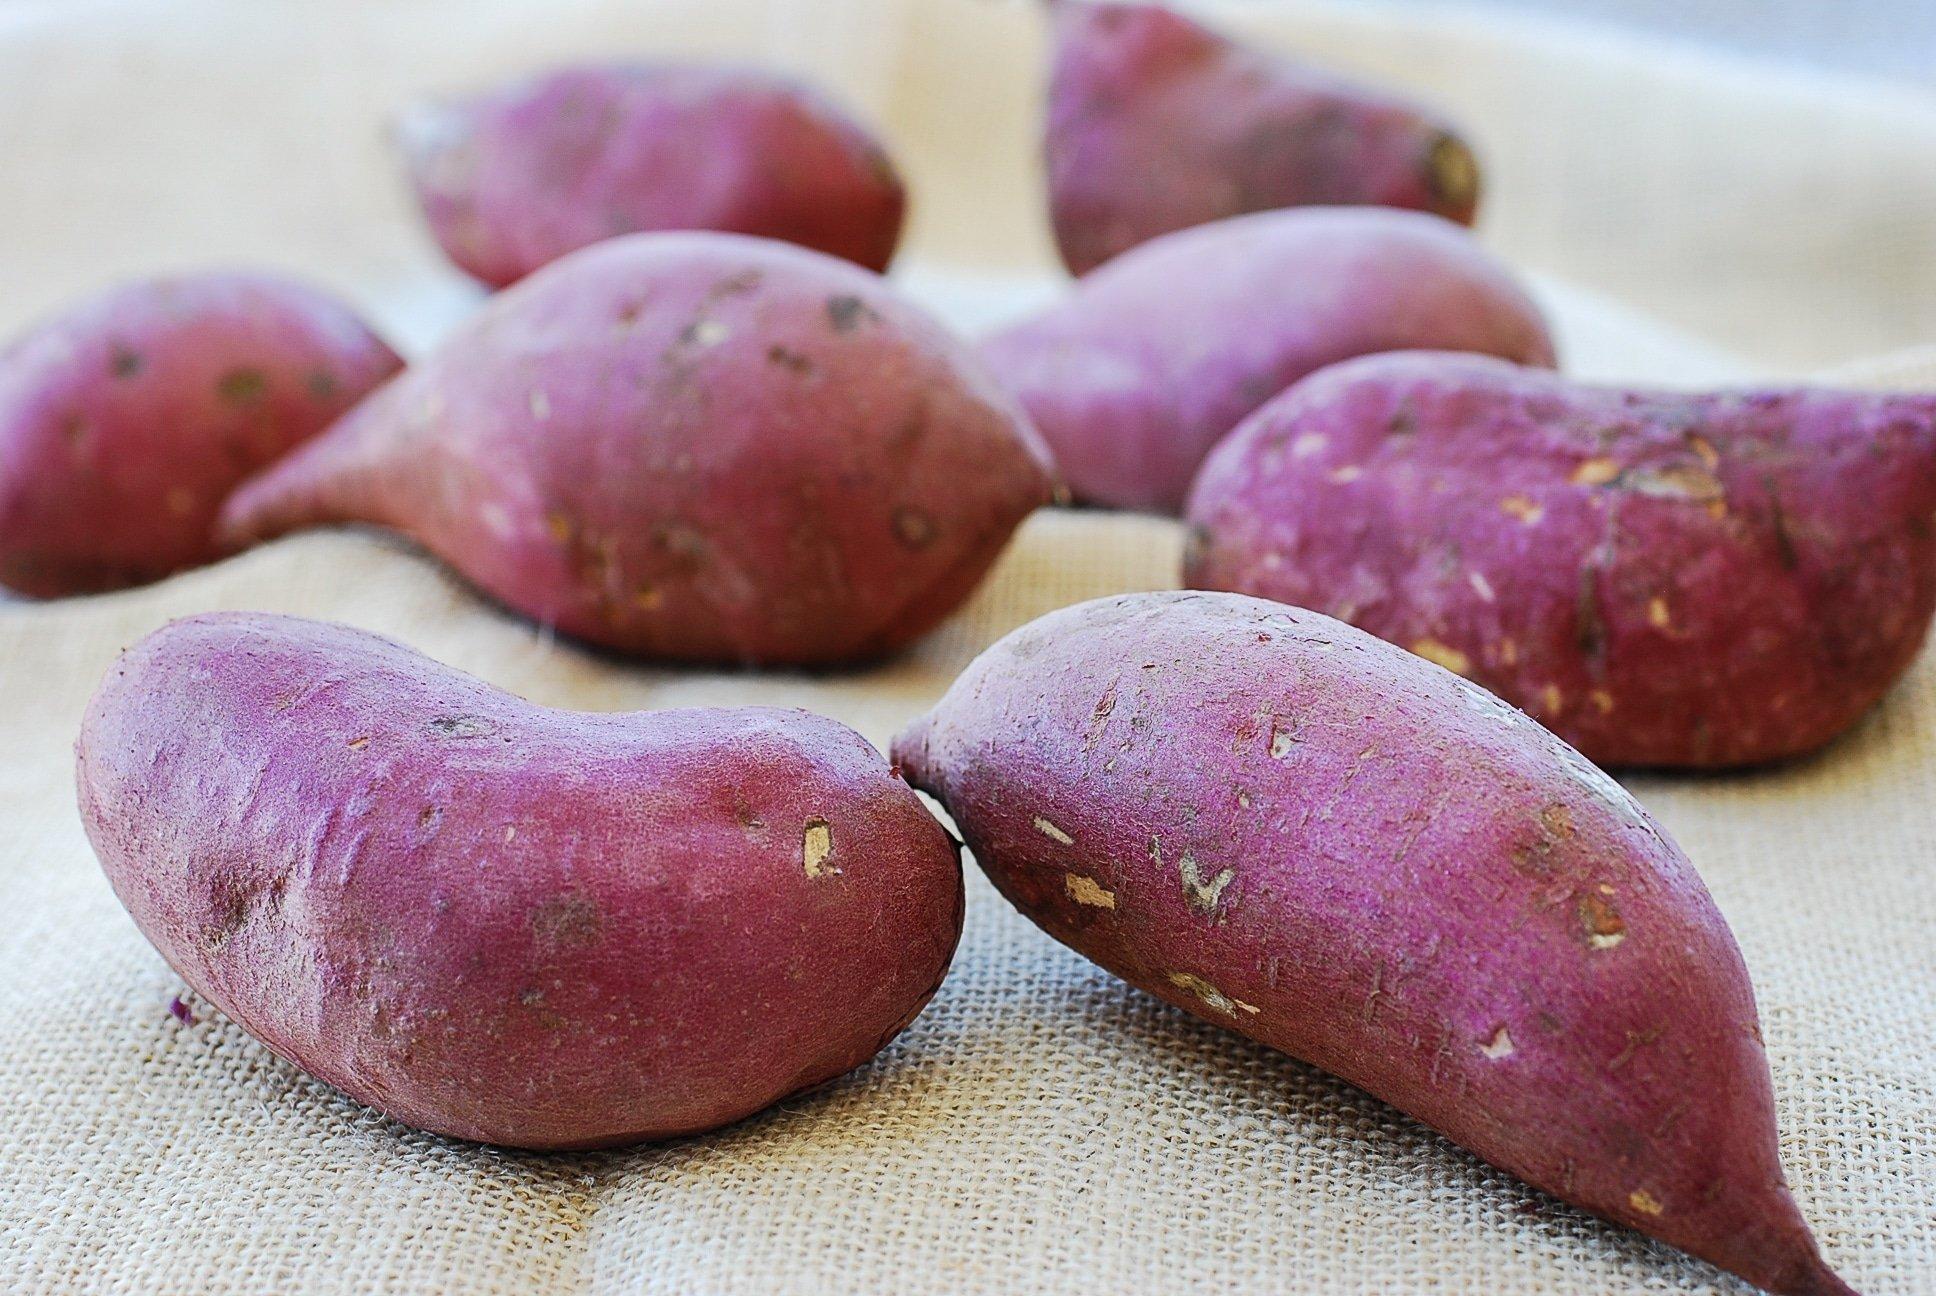 DSC 0906 2 - Dried Sweet Potato (Goguma Mallaengi)